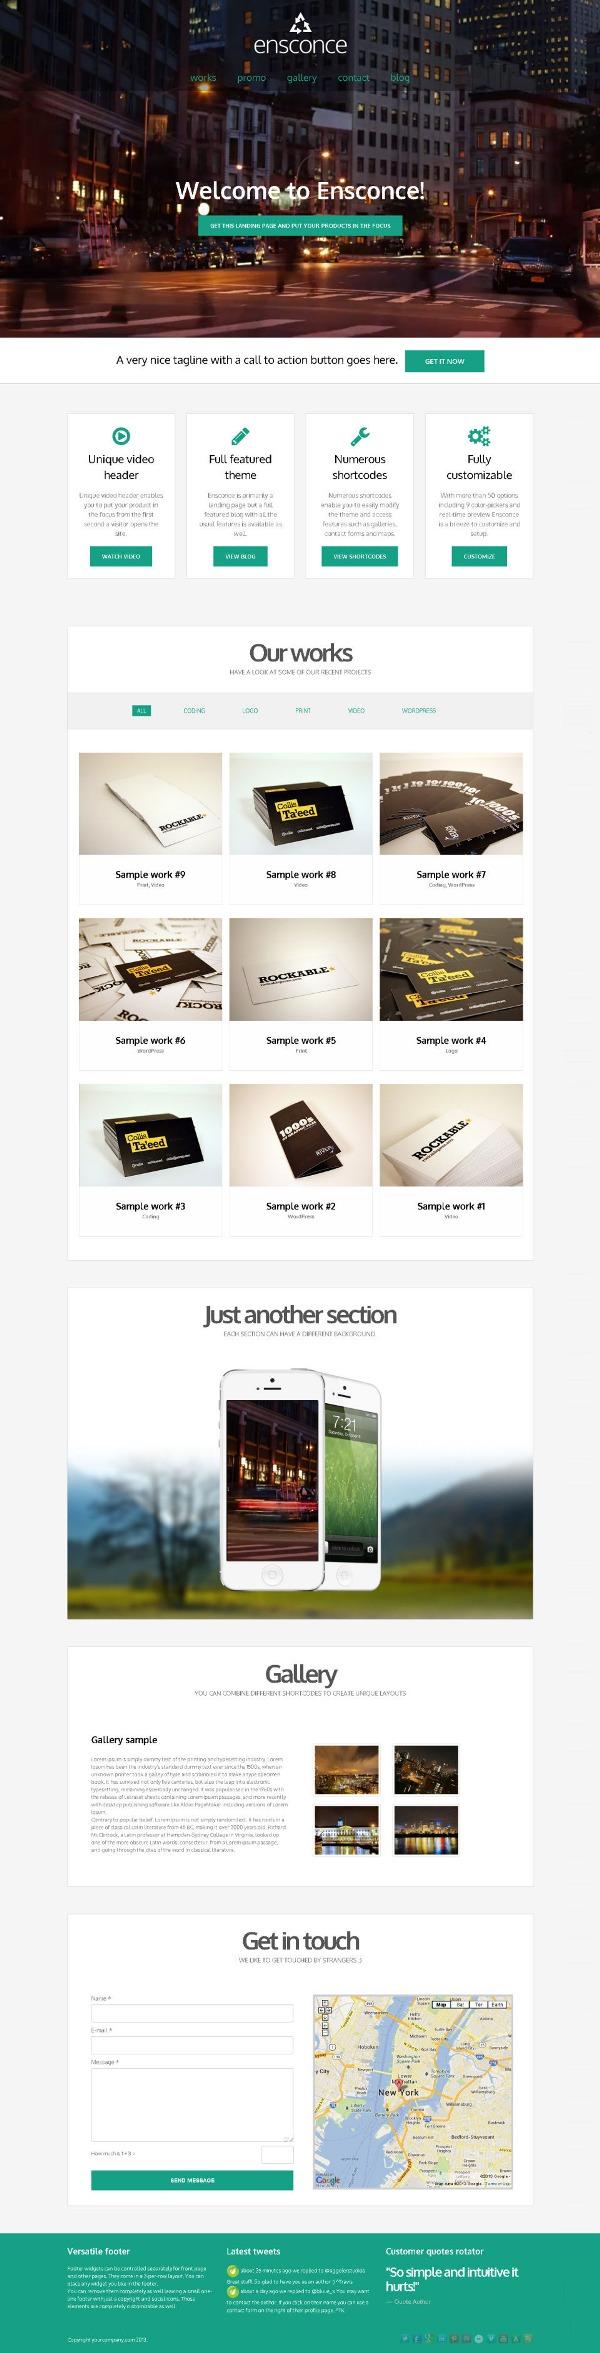 Ensconce – Responsive WordPress Video Landing Page